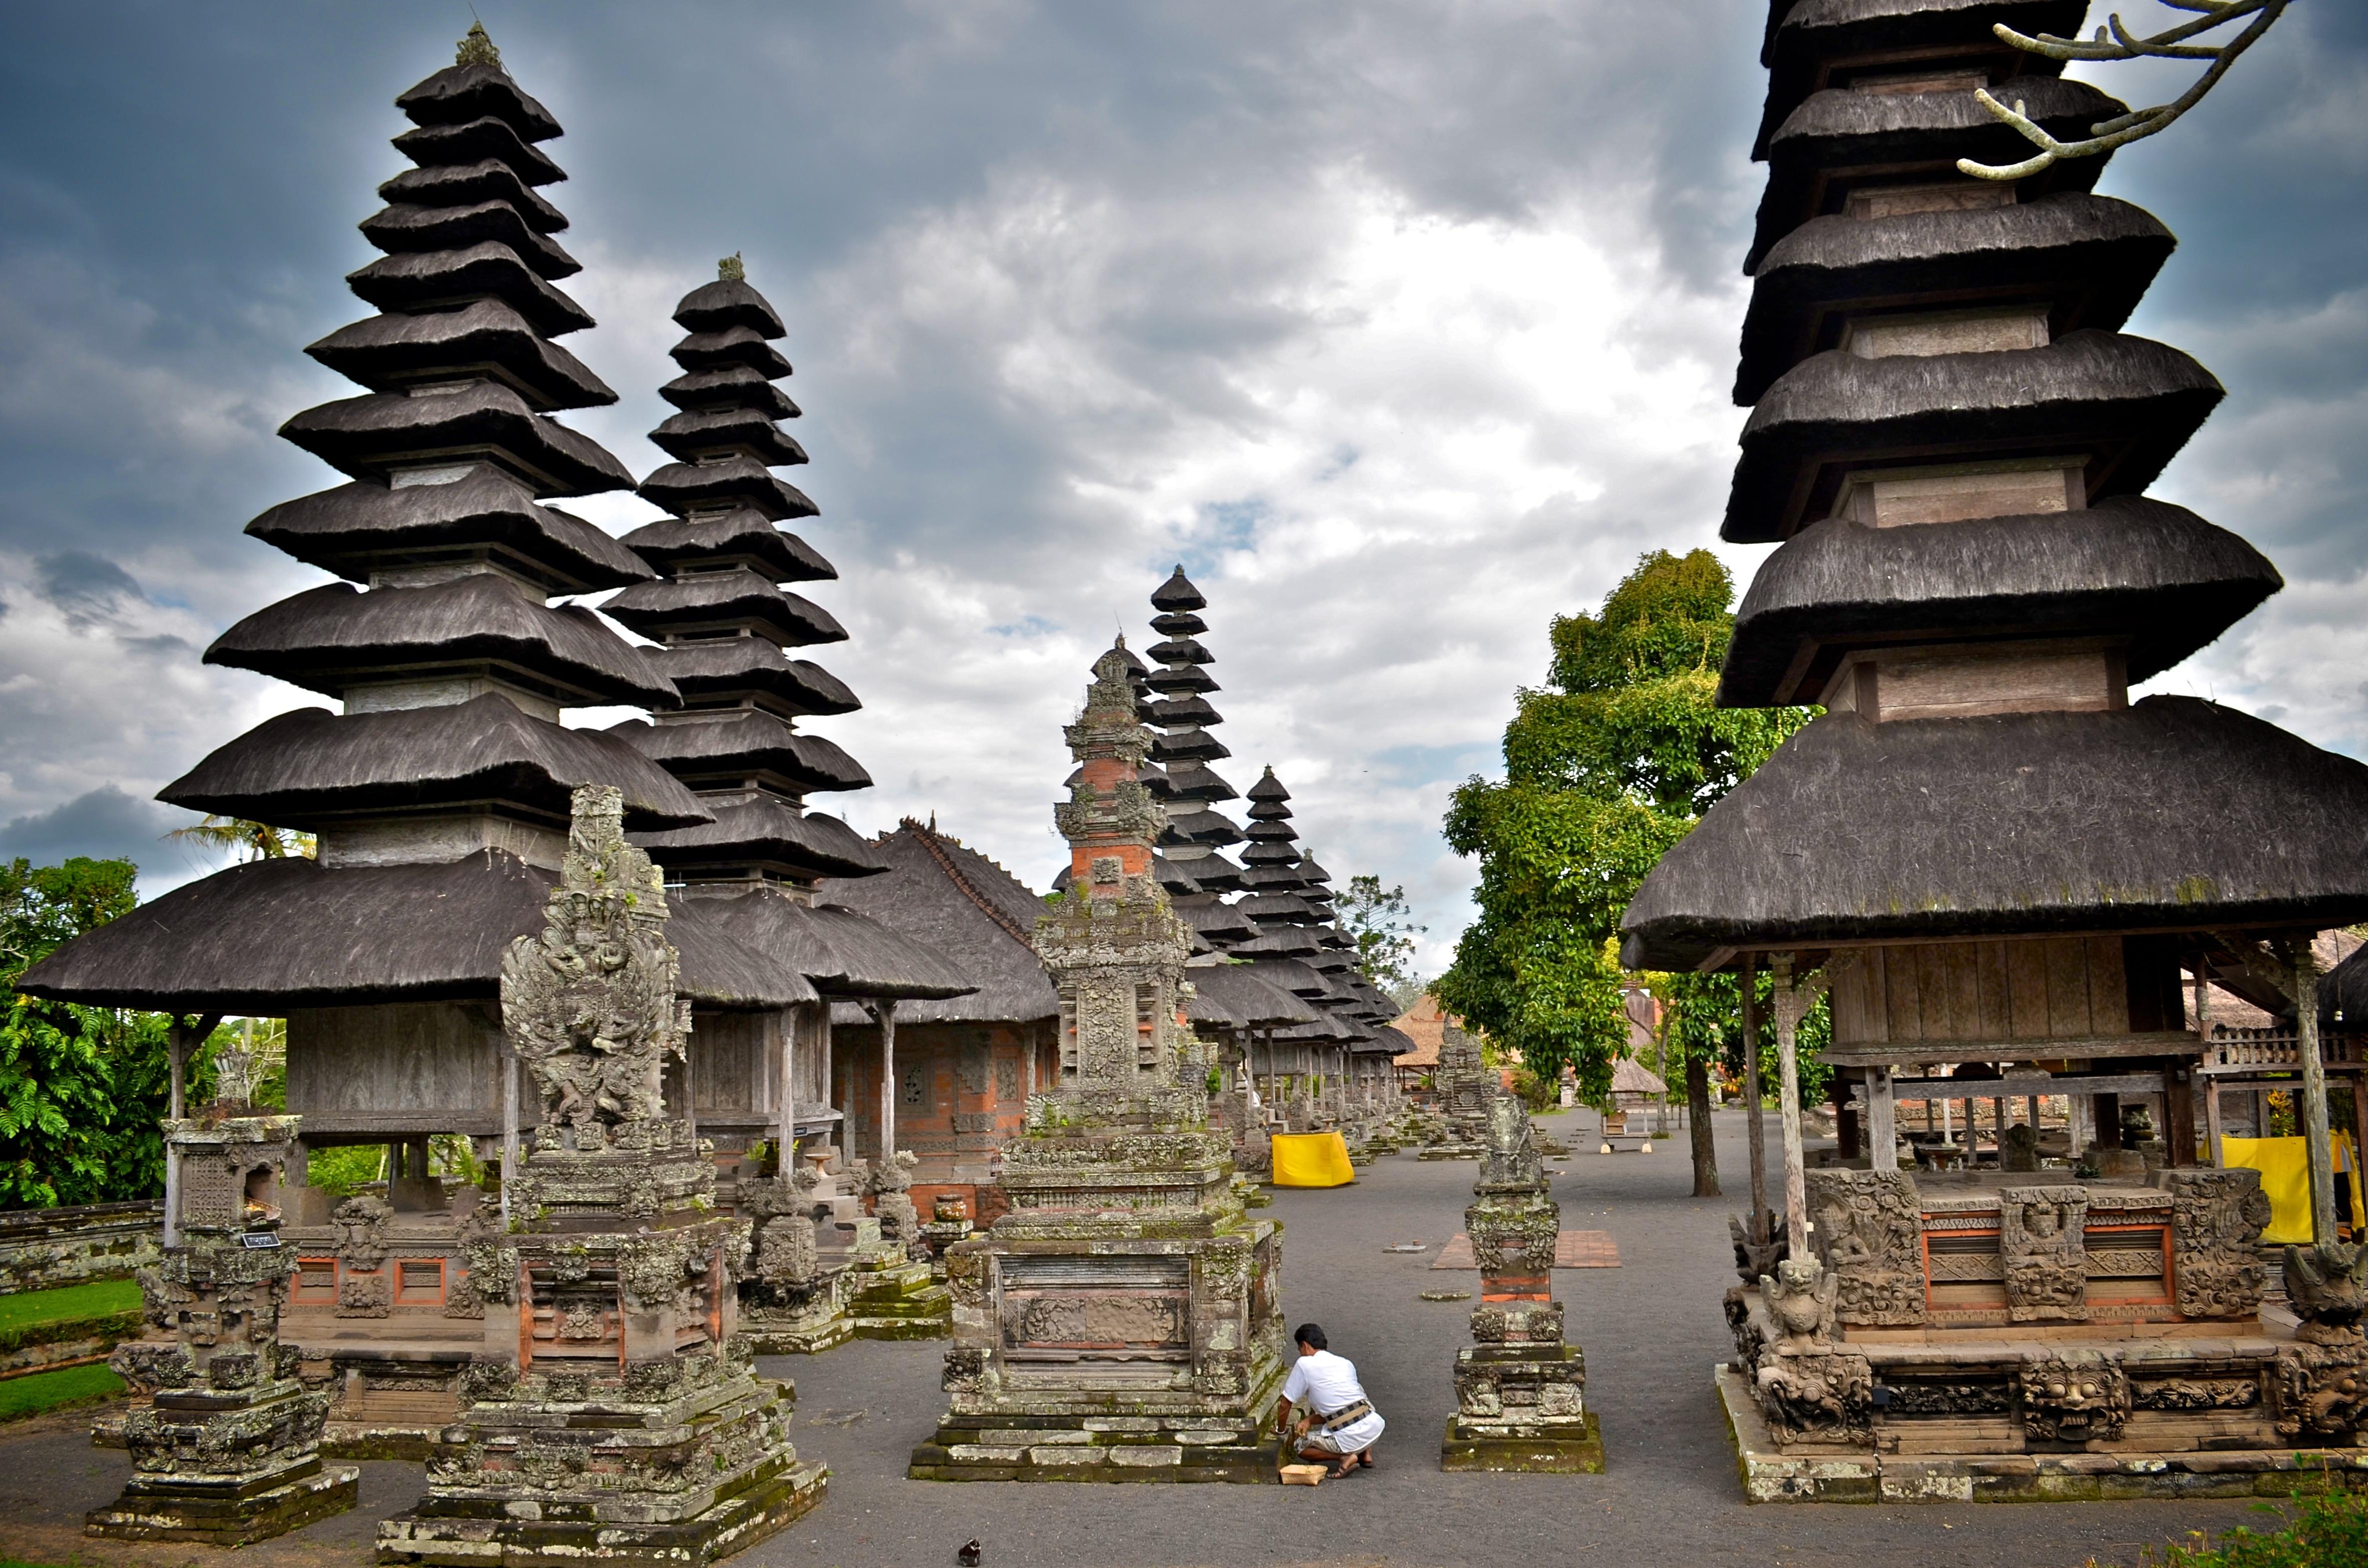 Bali_Taman_Ayun-003